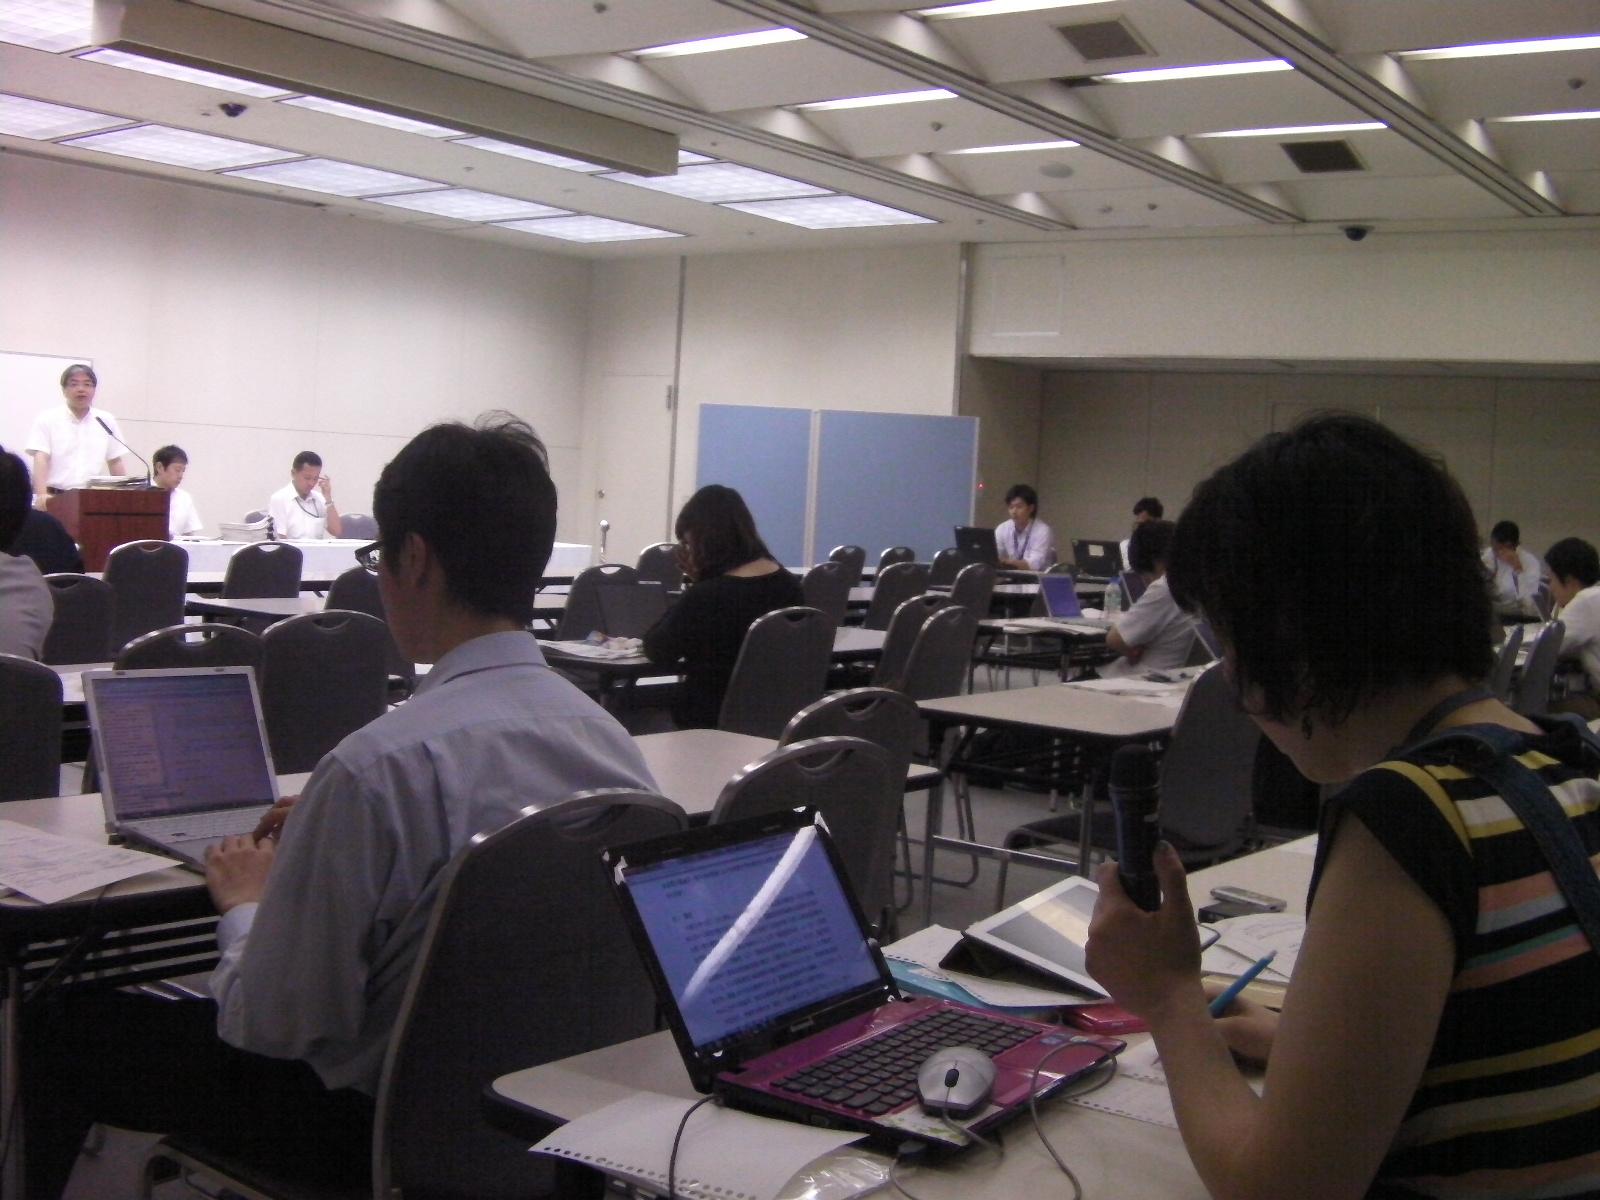 http://daily.magazine9.jp/m9/oshidori/SANY0137.JPG